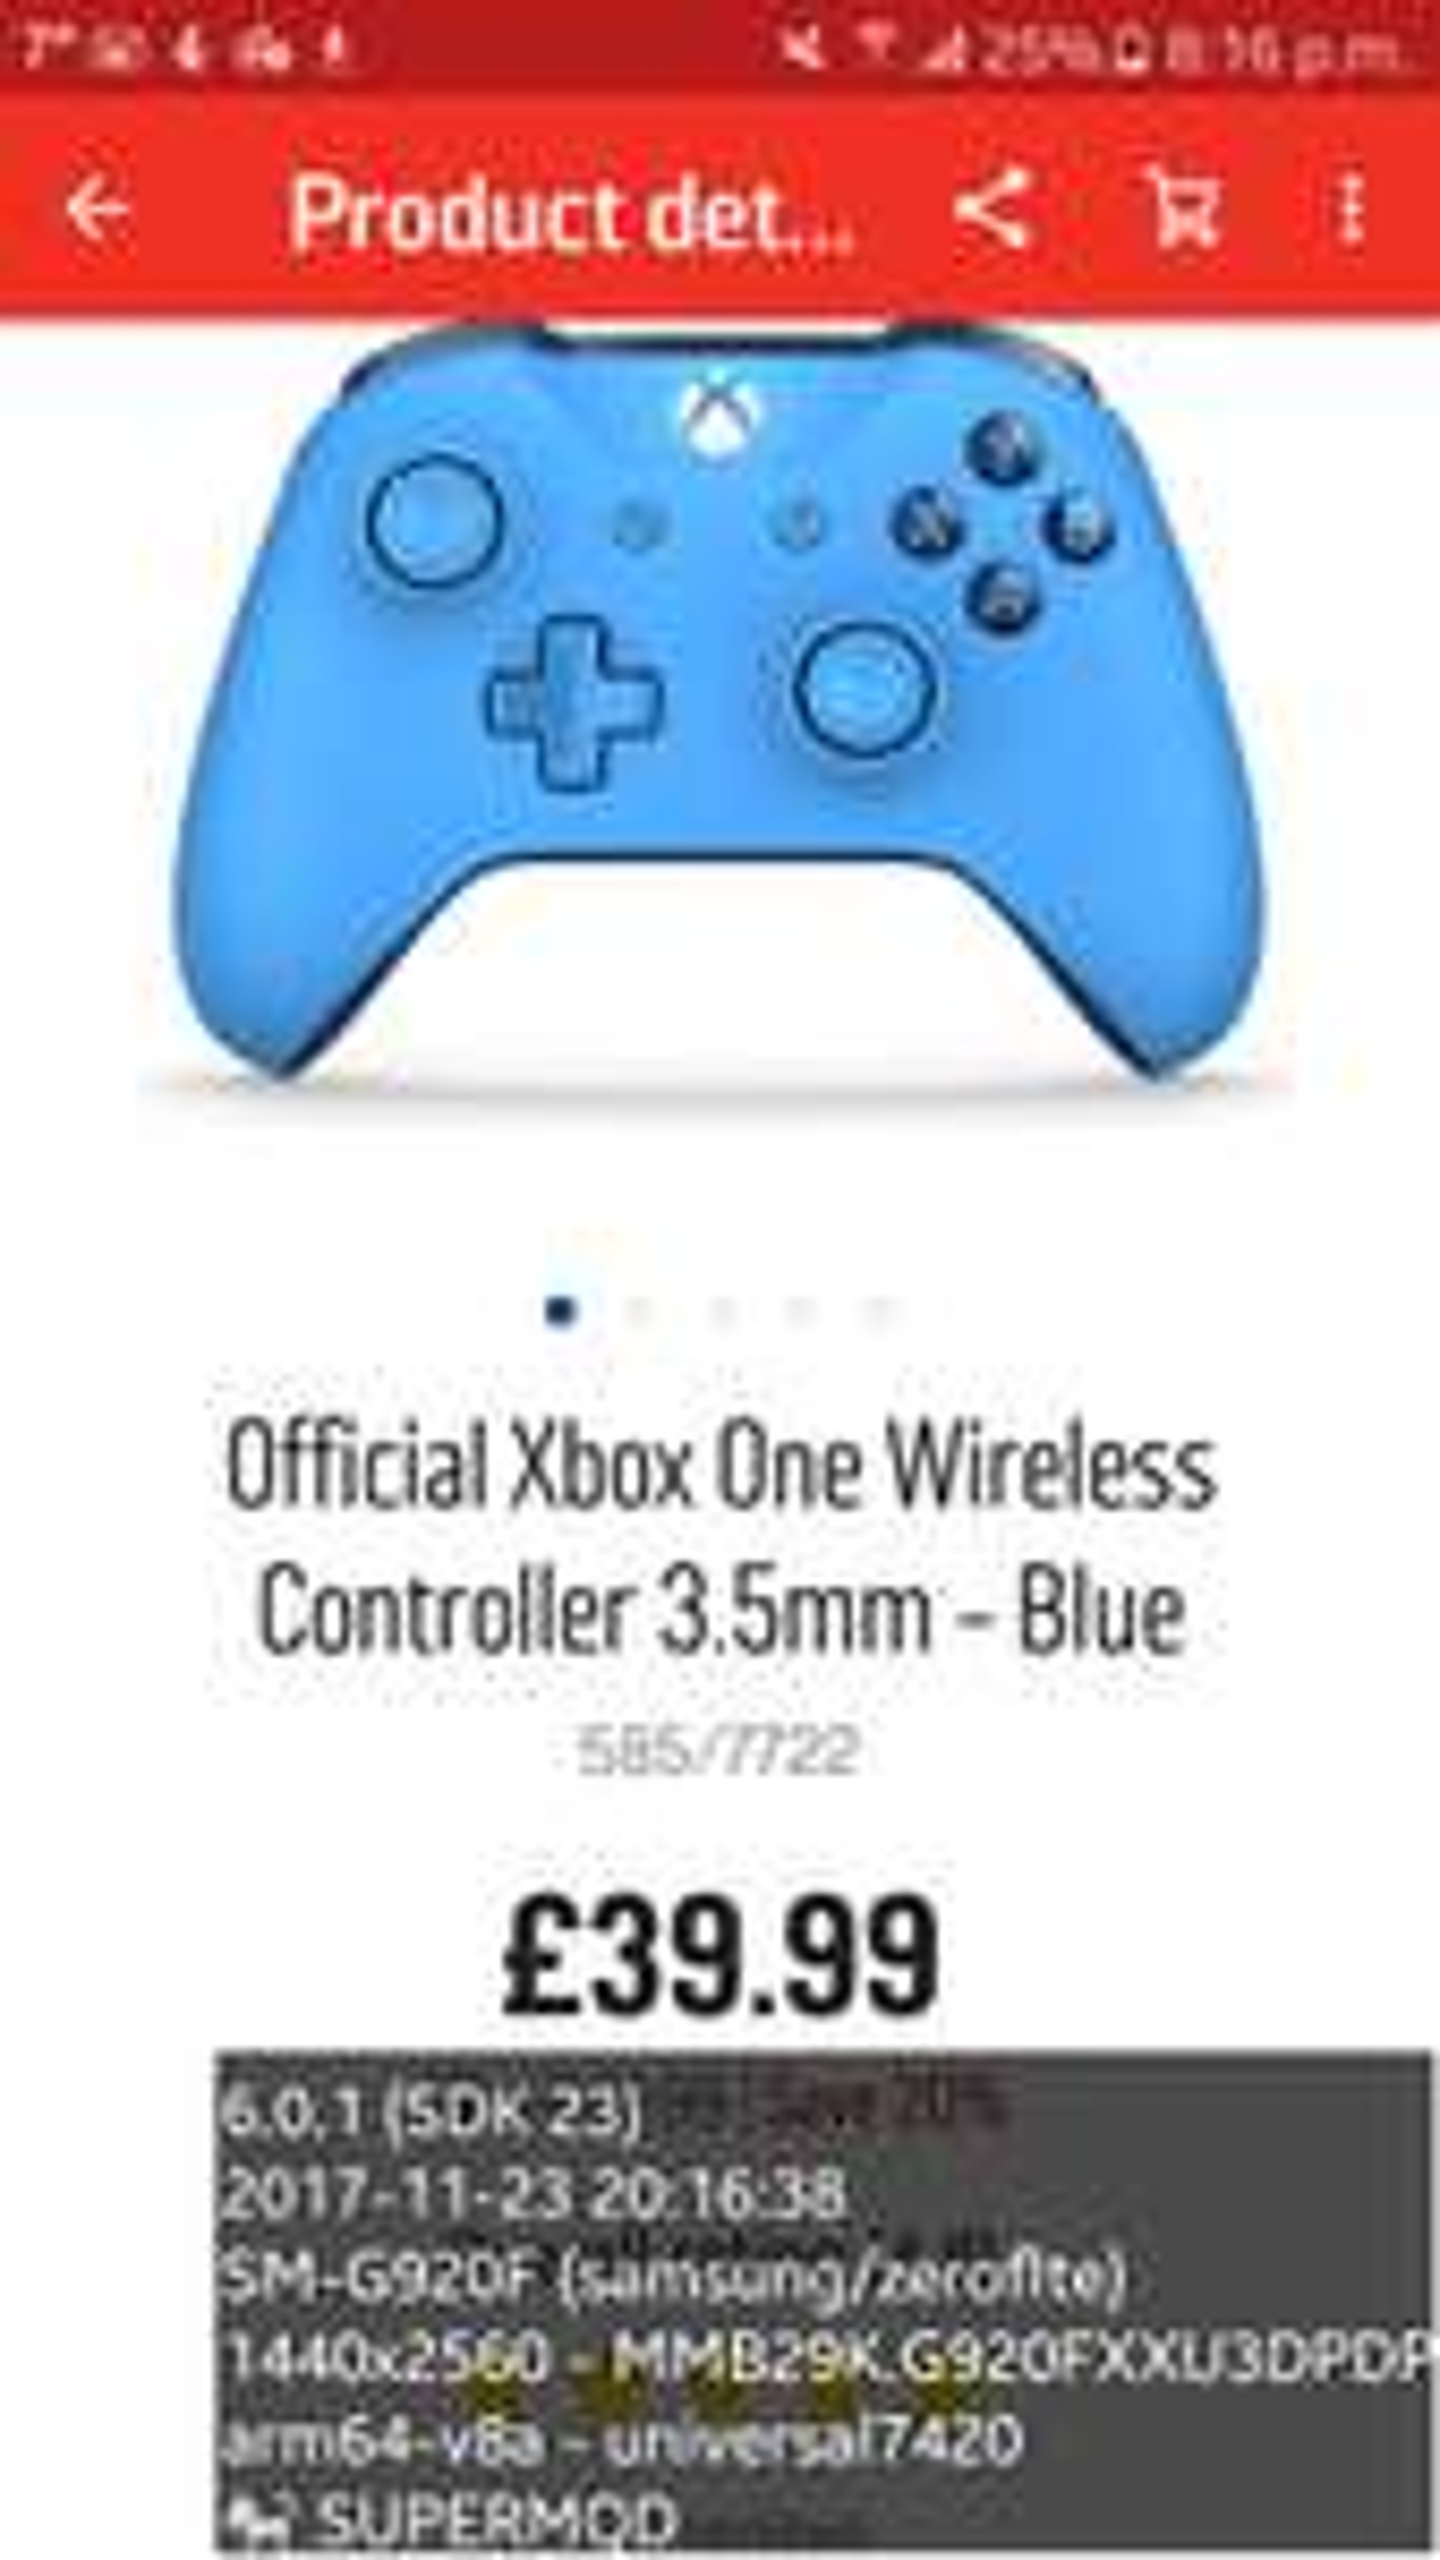 xbox one controllers 39.99 @ argos